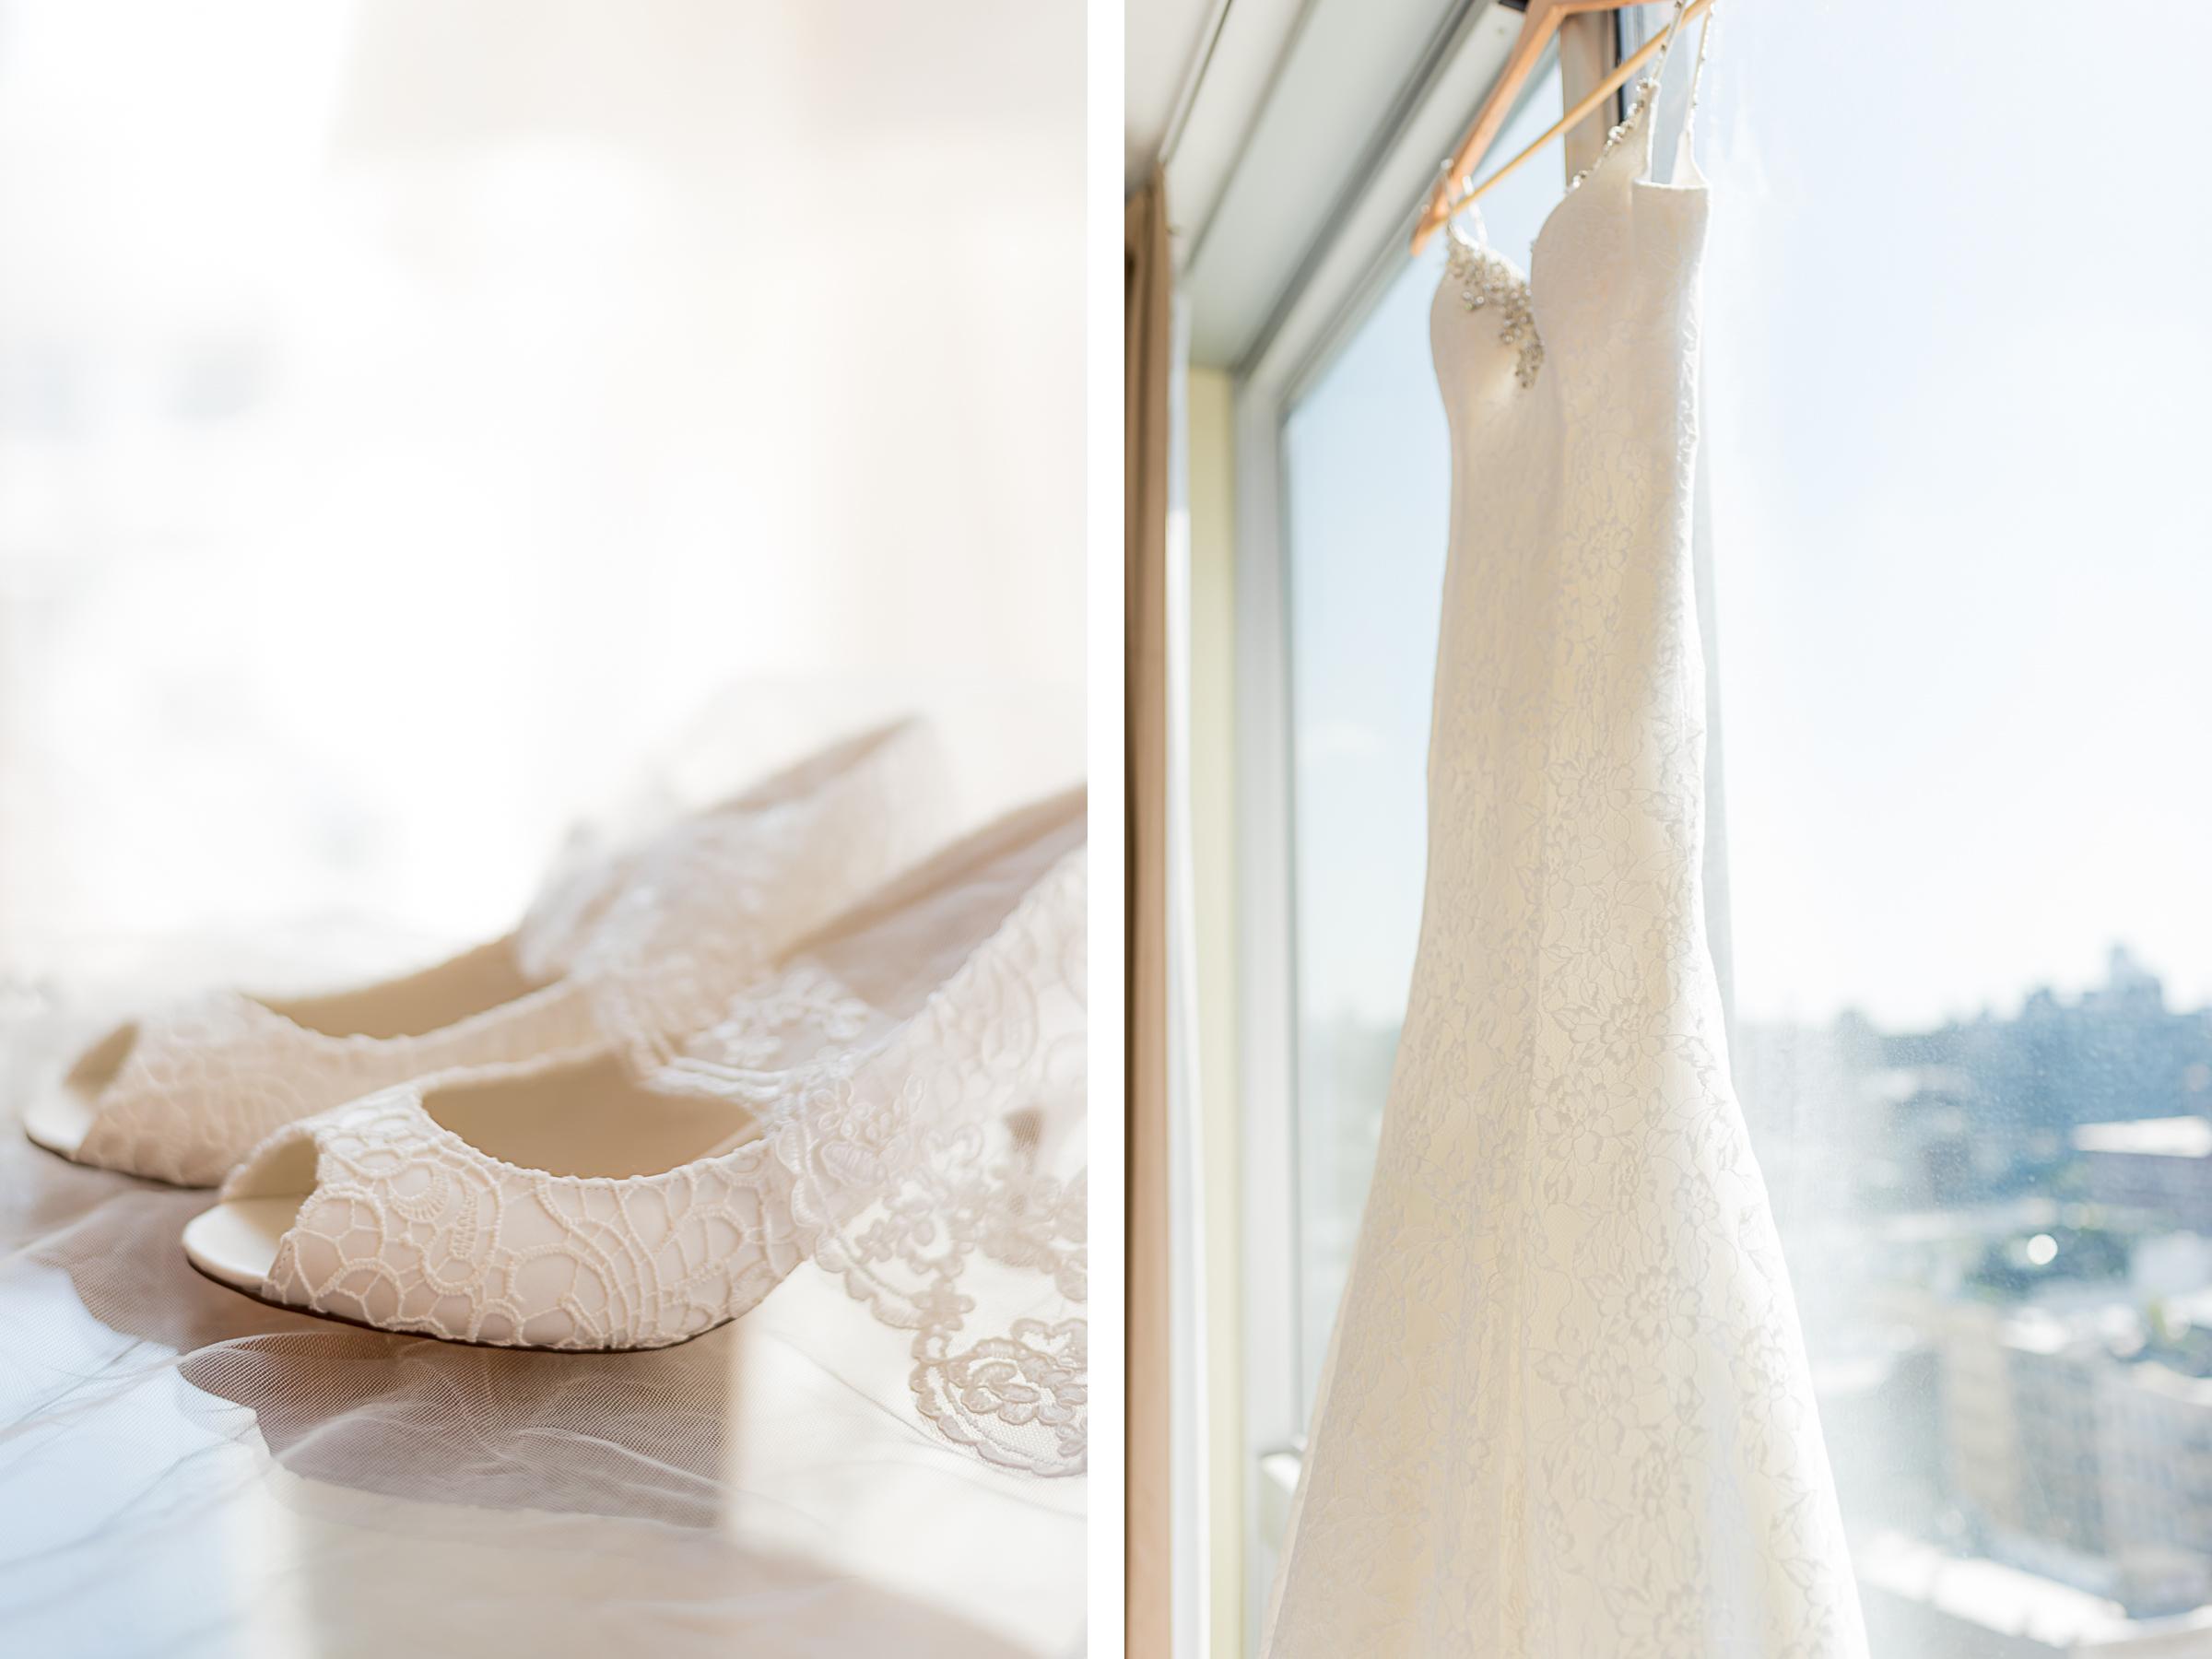 NYC-Ramscale-Wedding-Bride-Get-Ready-Dress-Shoes.jpg